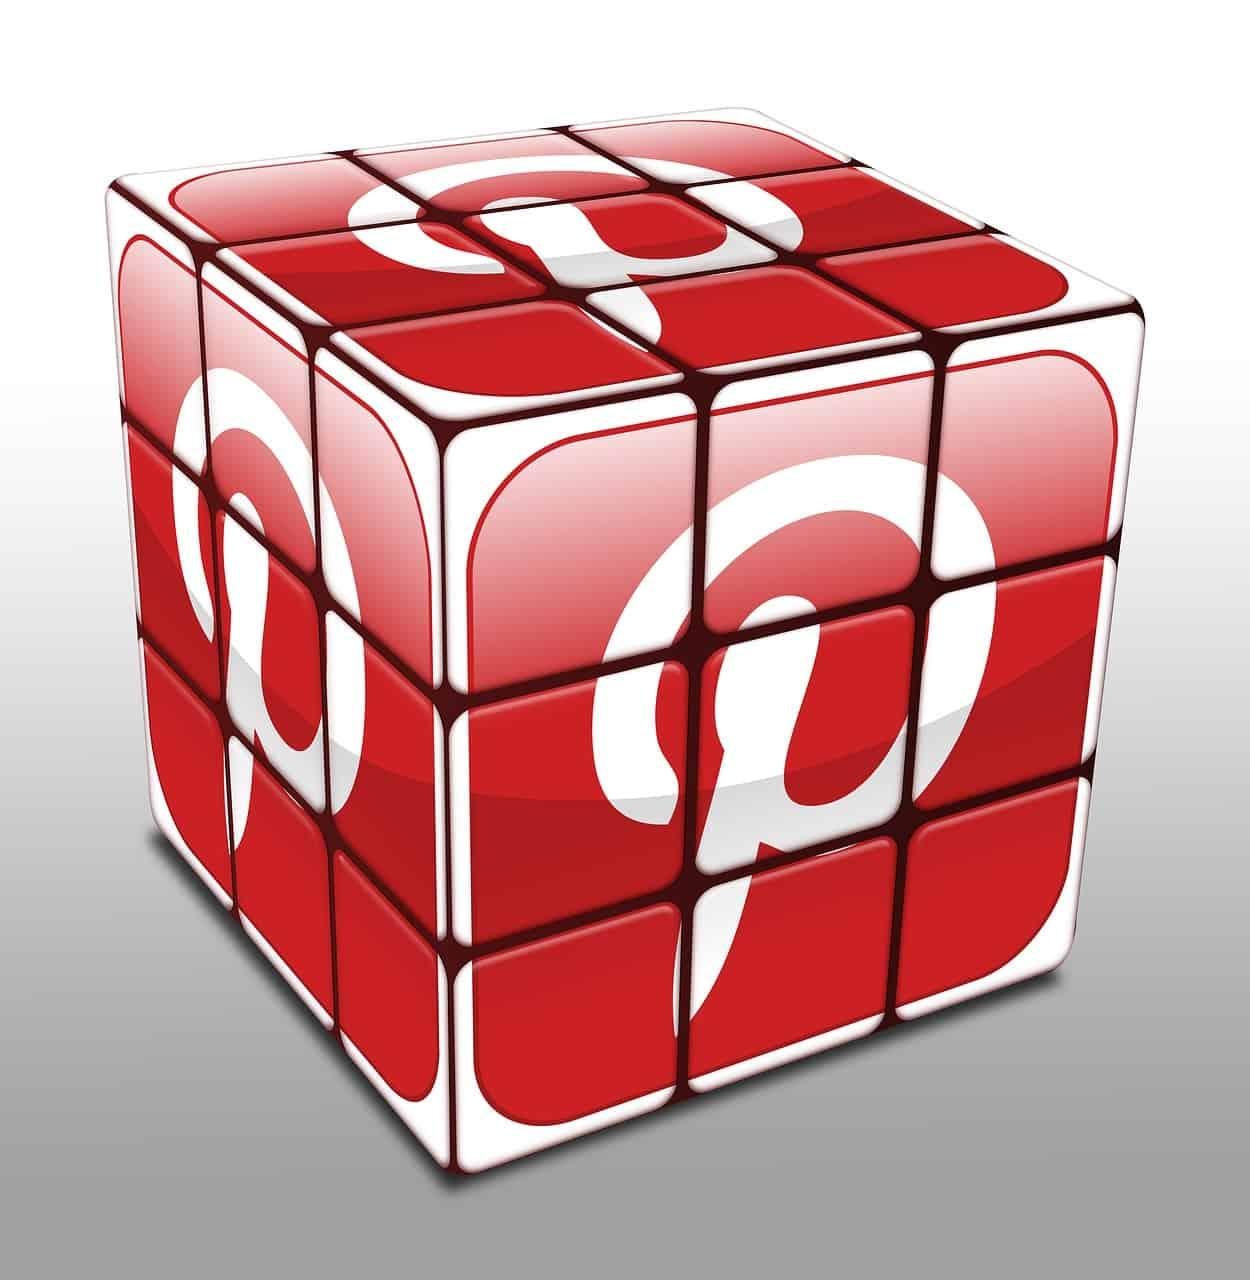 3 Ways to Optimize Pinterest to Your Advantage